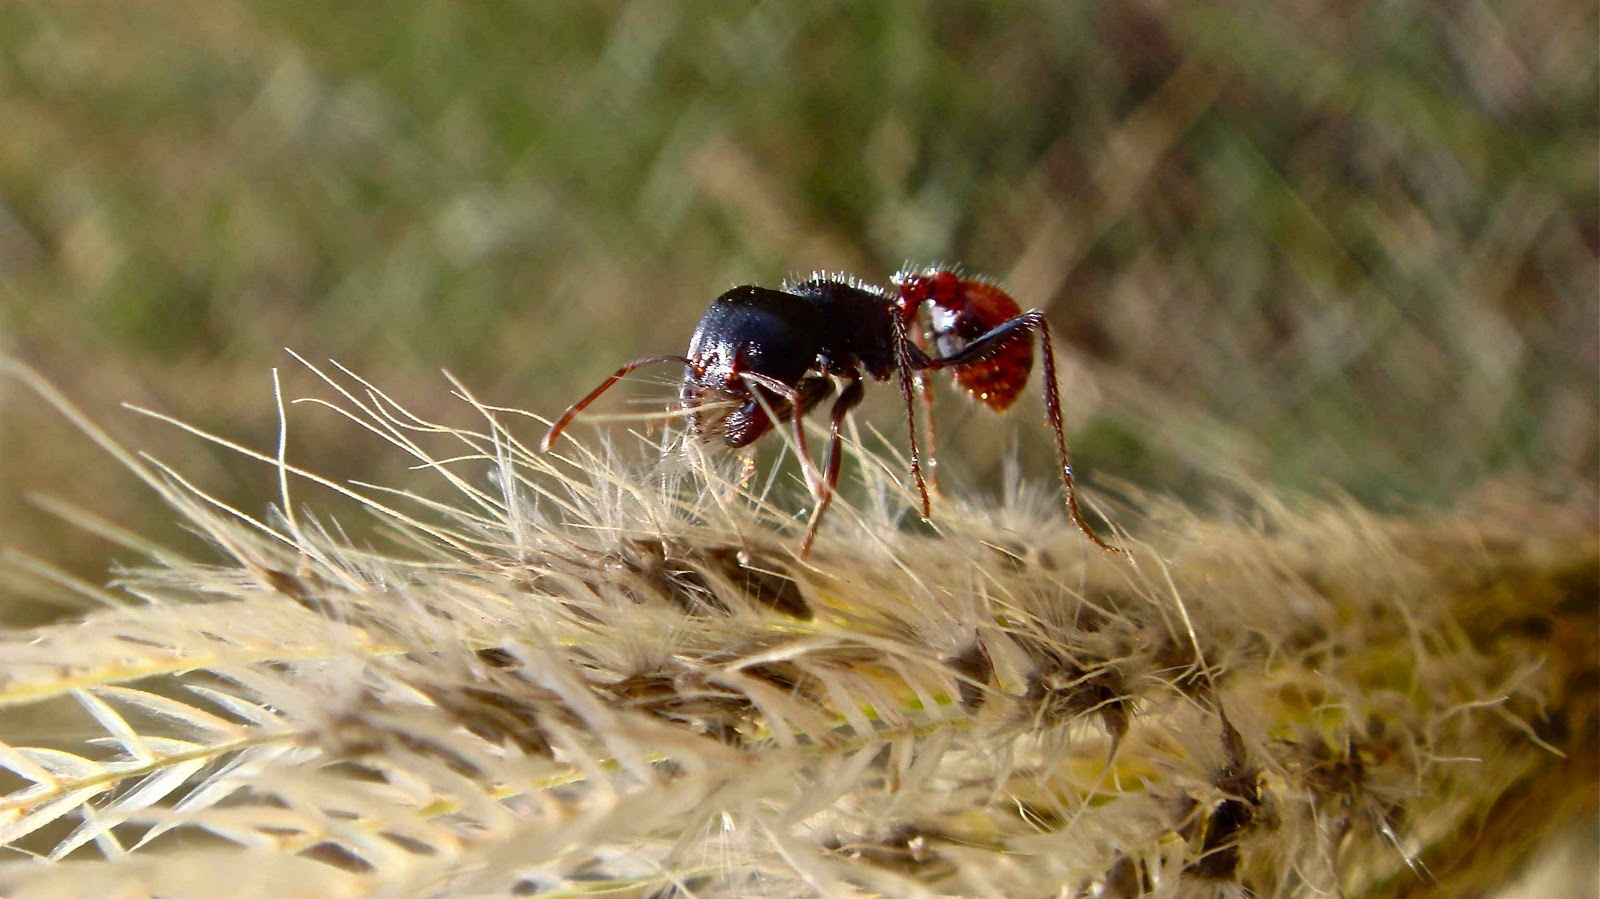 Harvester ants - photo#51